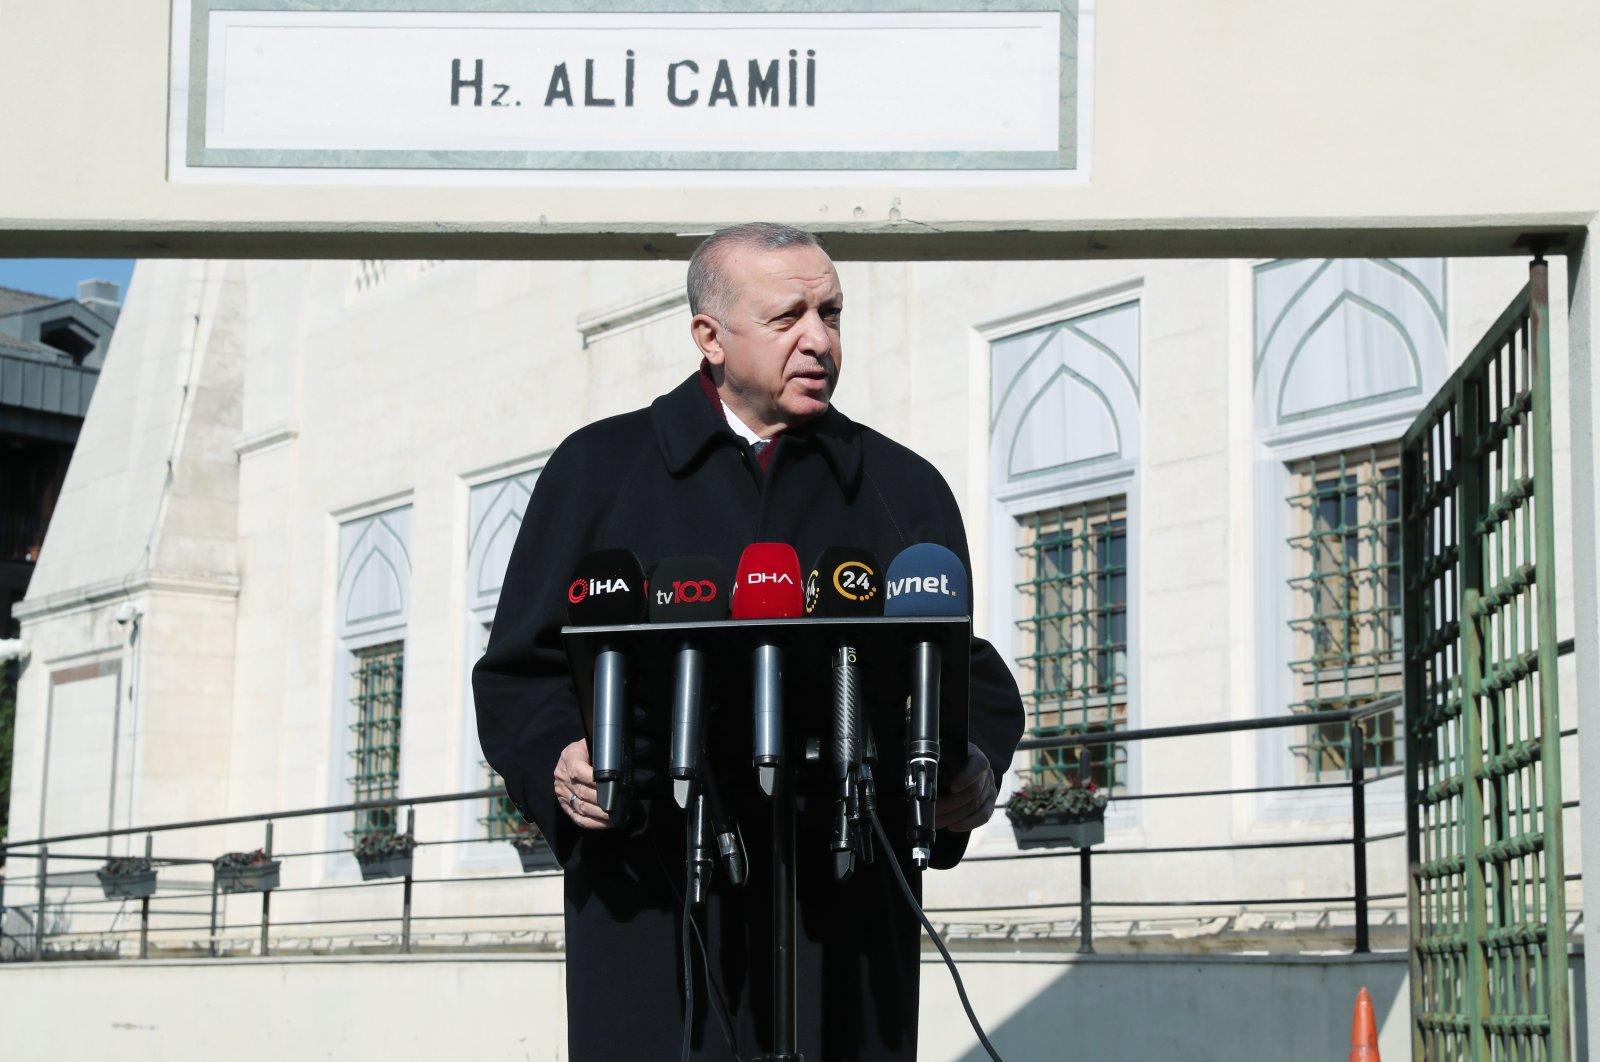 President Recep Tayyip Erdoğan speaks at the Ali Cami after a Friday prayer, Istanbul, Feb. 5, 2021. (AA Photo)